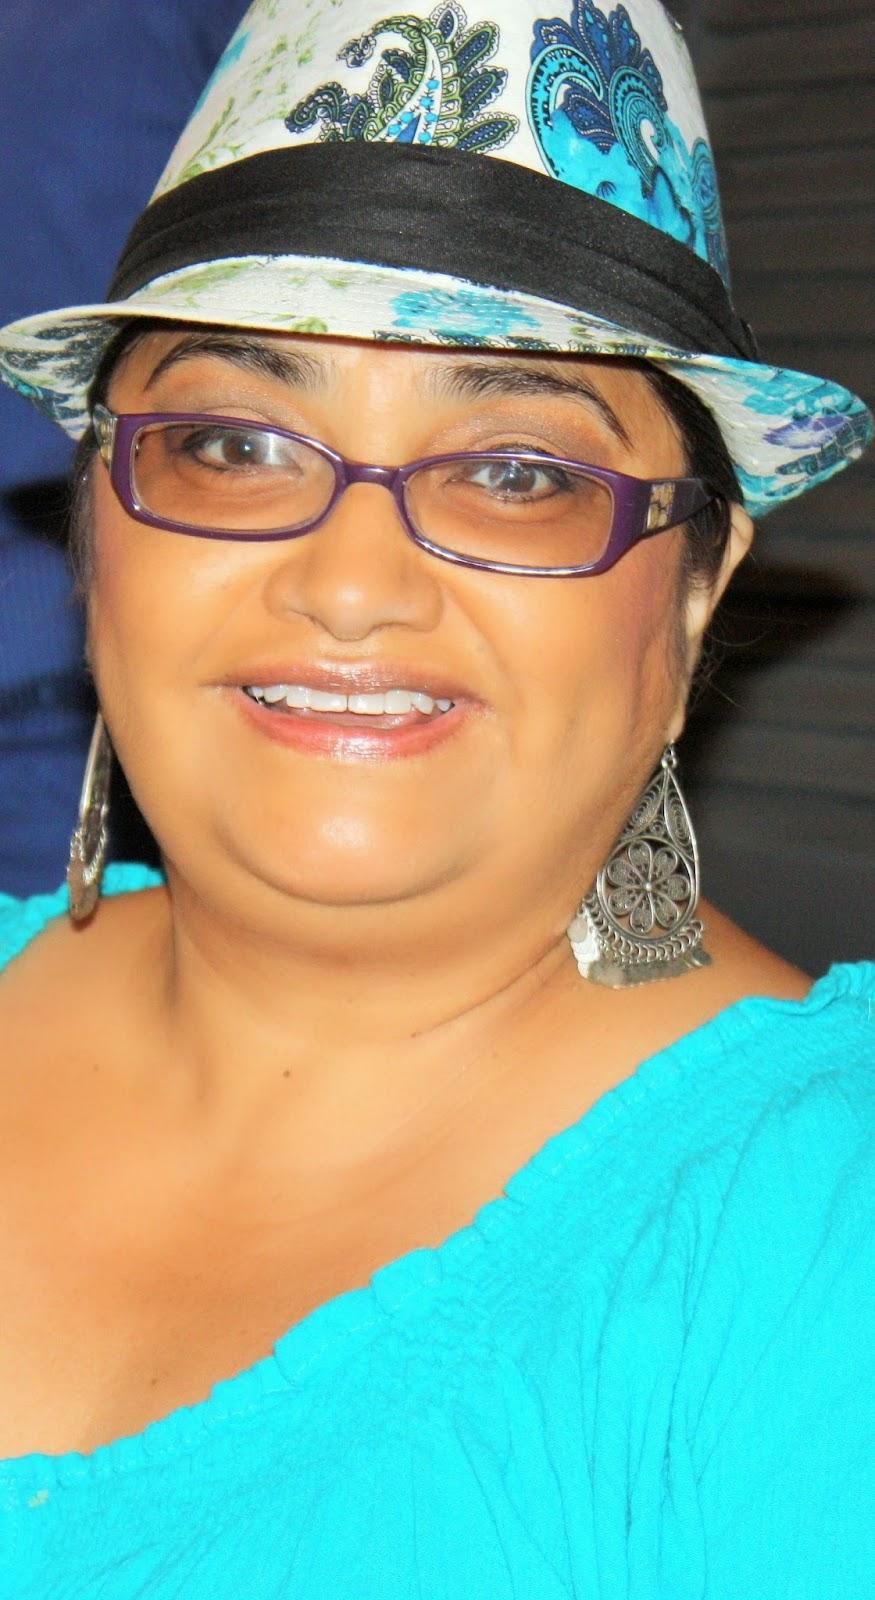 yauco county hispanic single women Some famous hispanic women, highlighting a few of the hispanic women who've made contributions to history some famous hispanic women, highlighting a few of the hispanic women who've made contributions to history famous hispanic women search the site go history & culture.